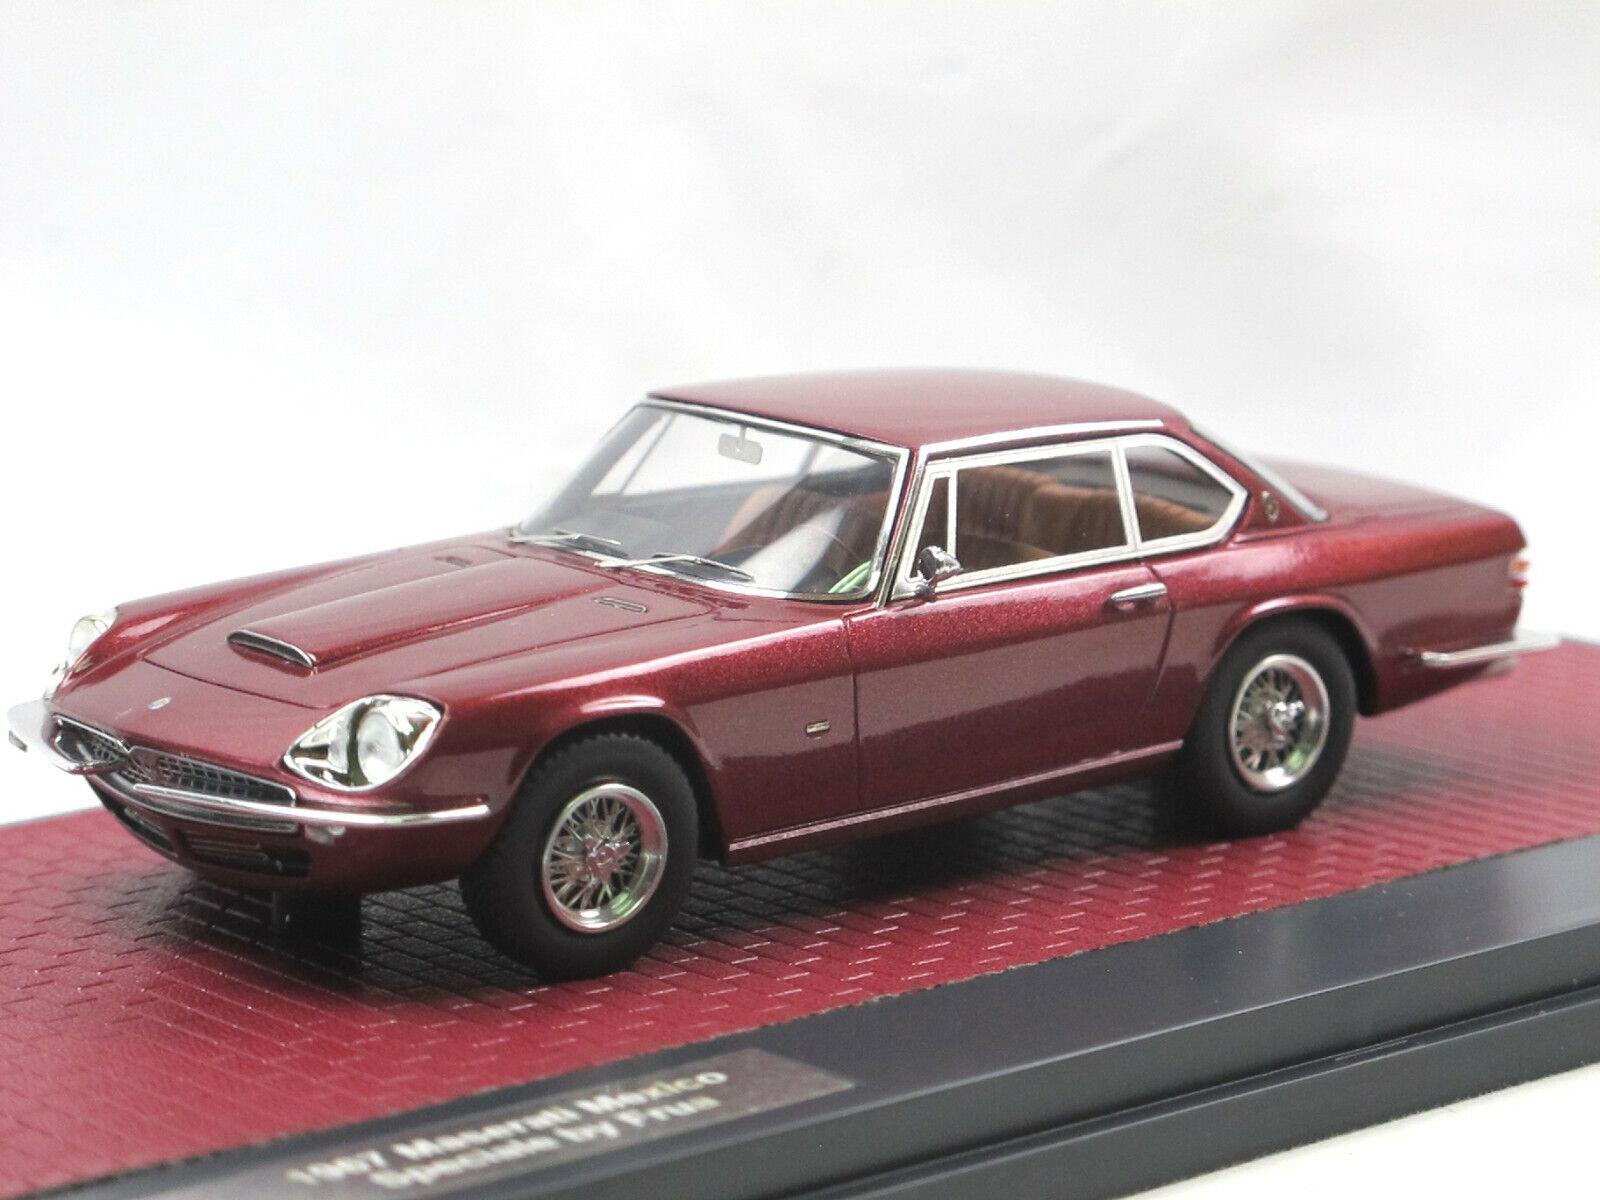 MATRIX SCALE MODELS 1967 Maserati Mexico SPECIALE by FRUA rouge Metallic 1 43